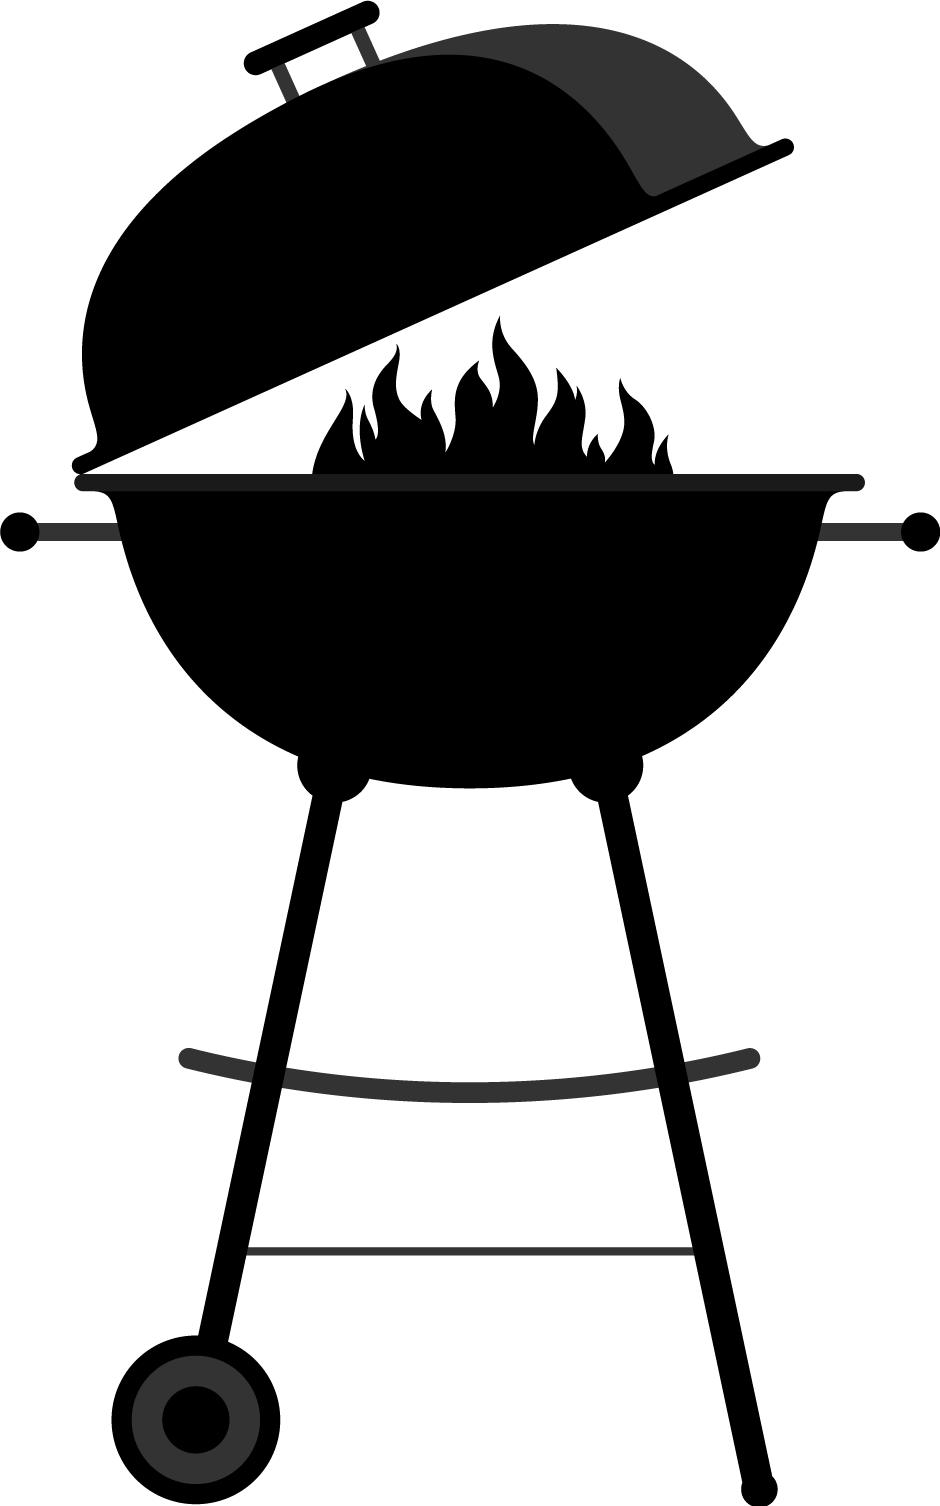 bbq icon kraan vlees service